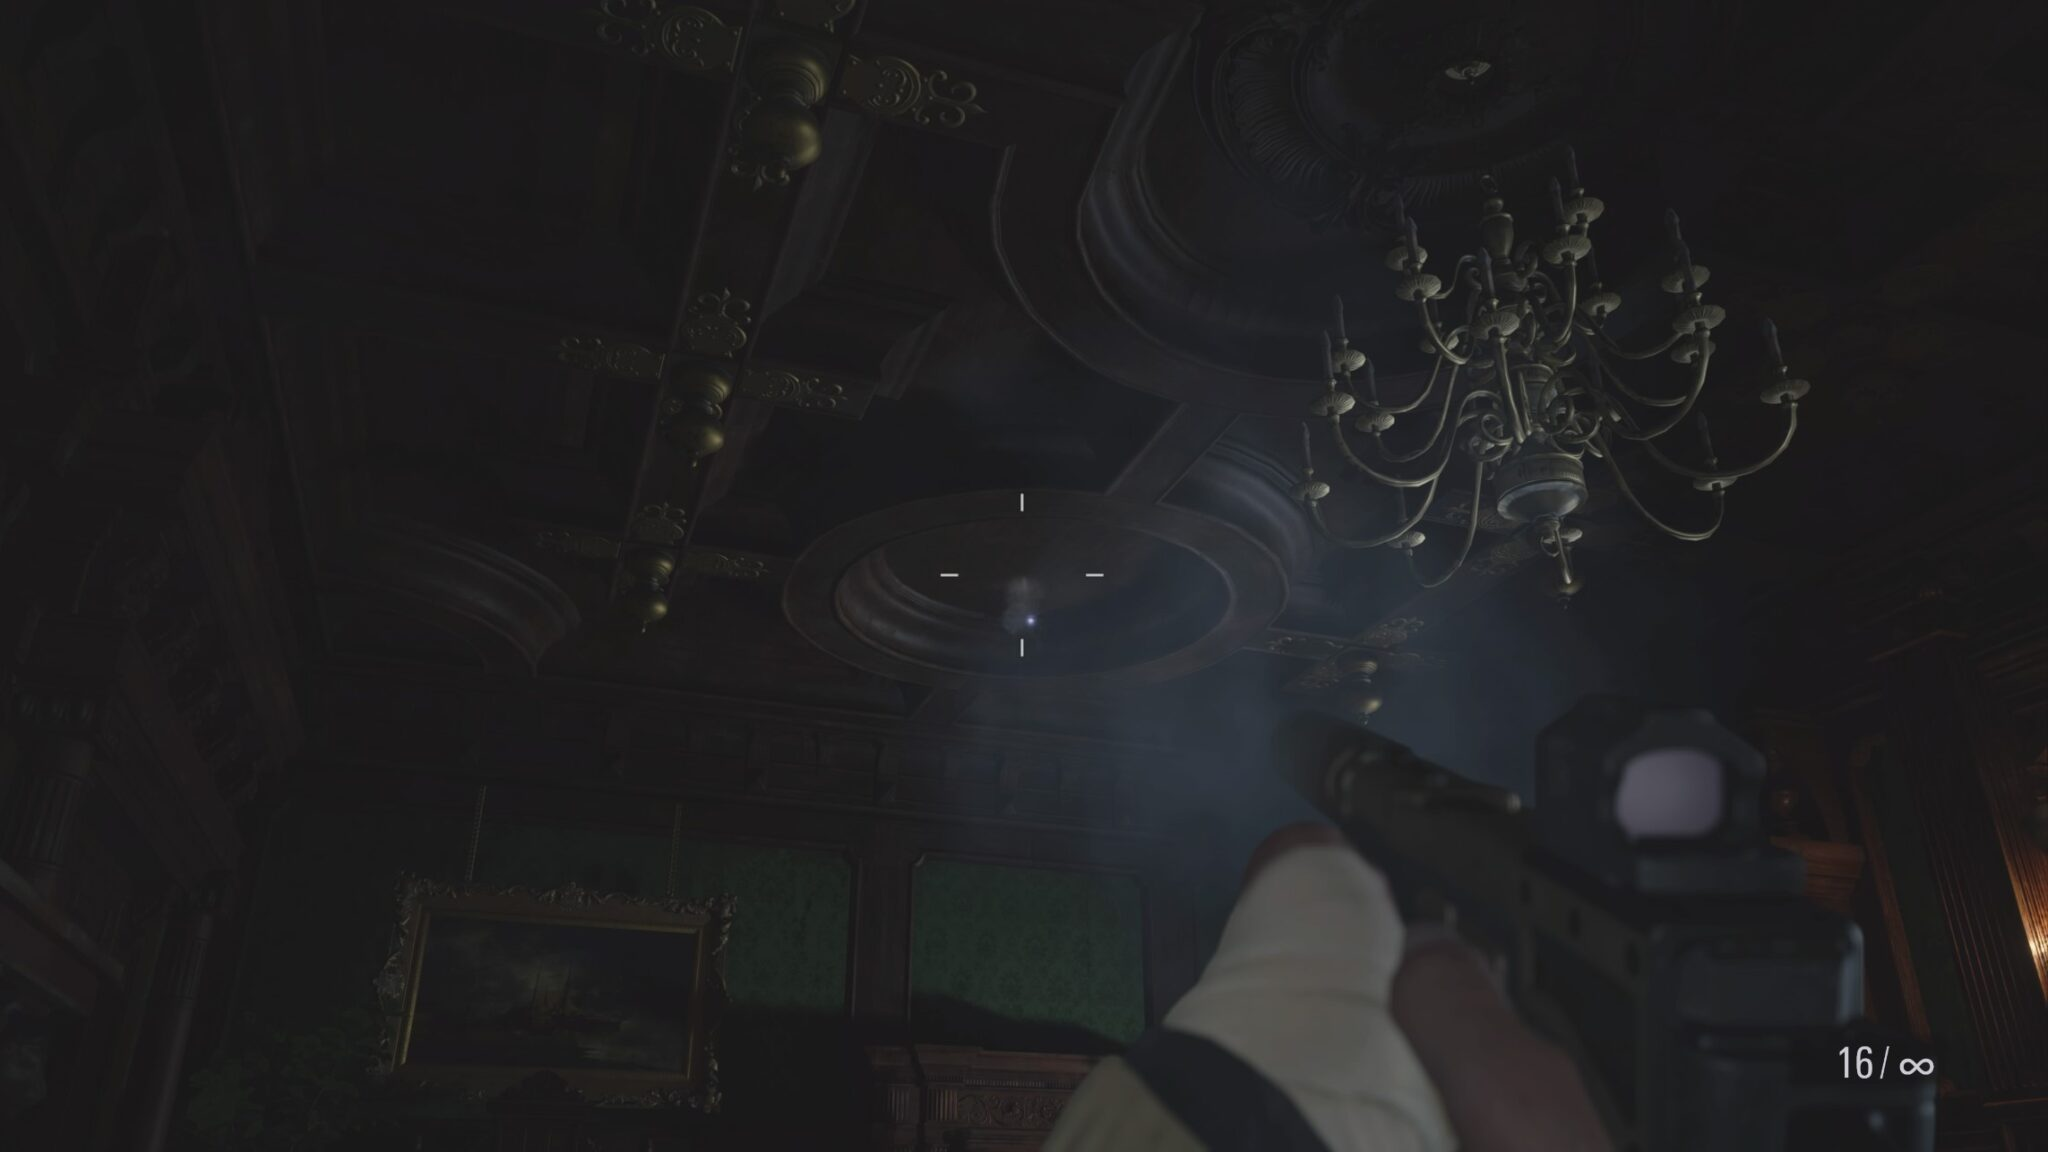 آموزش بازی Resident Evil Village